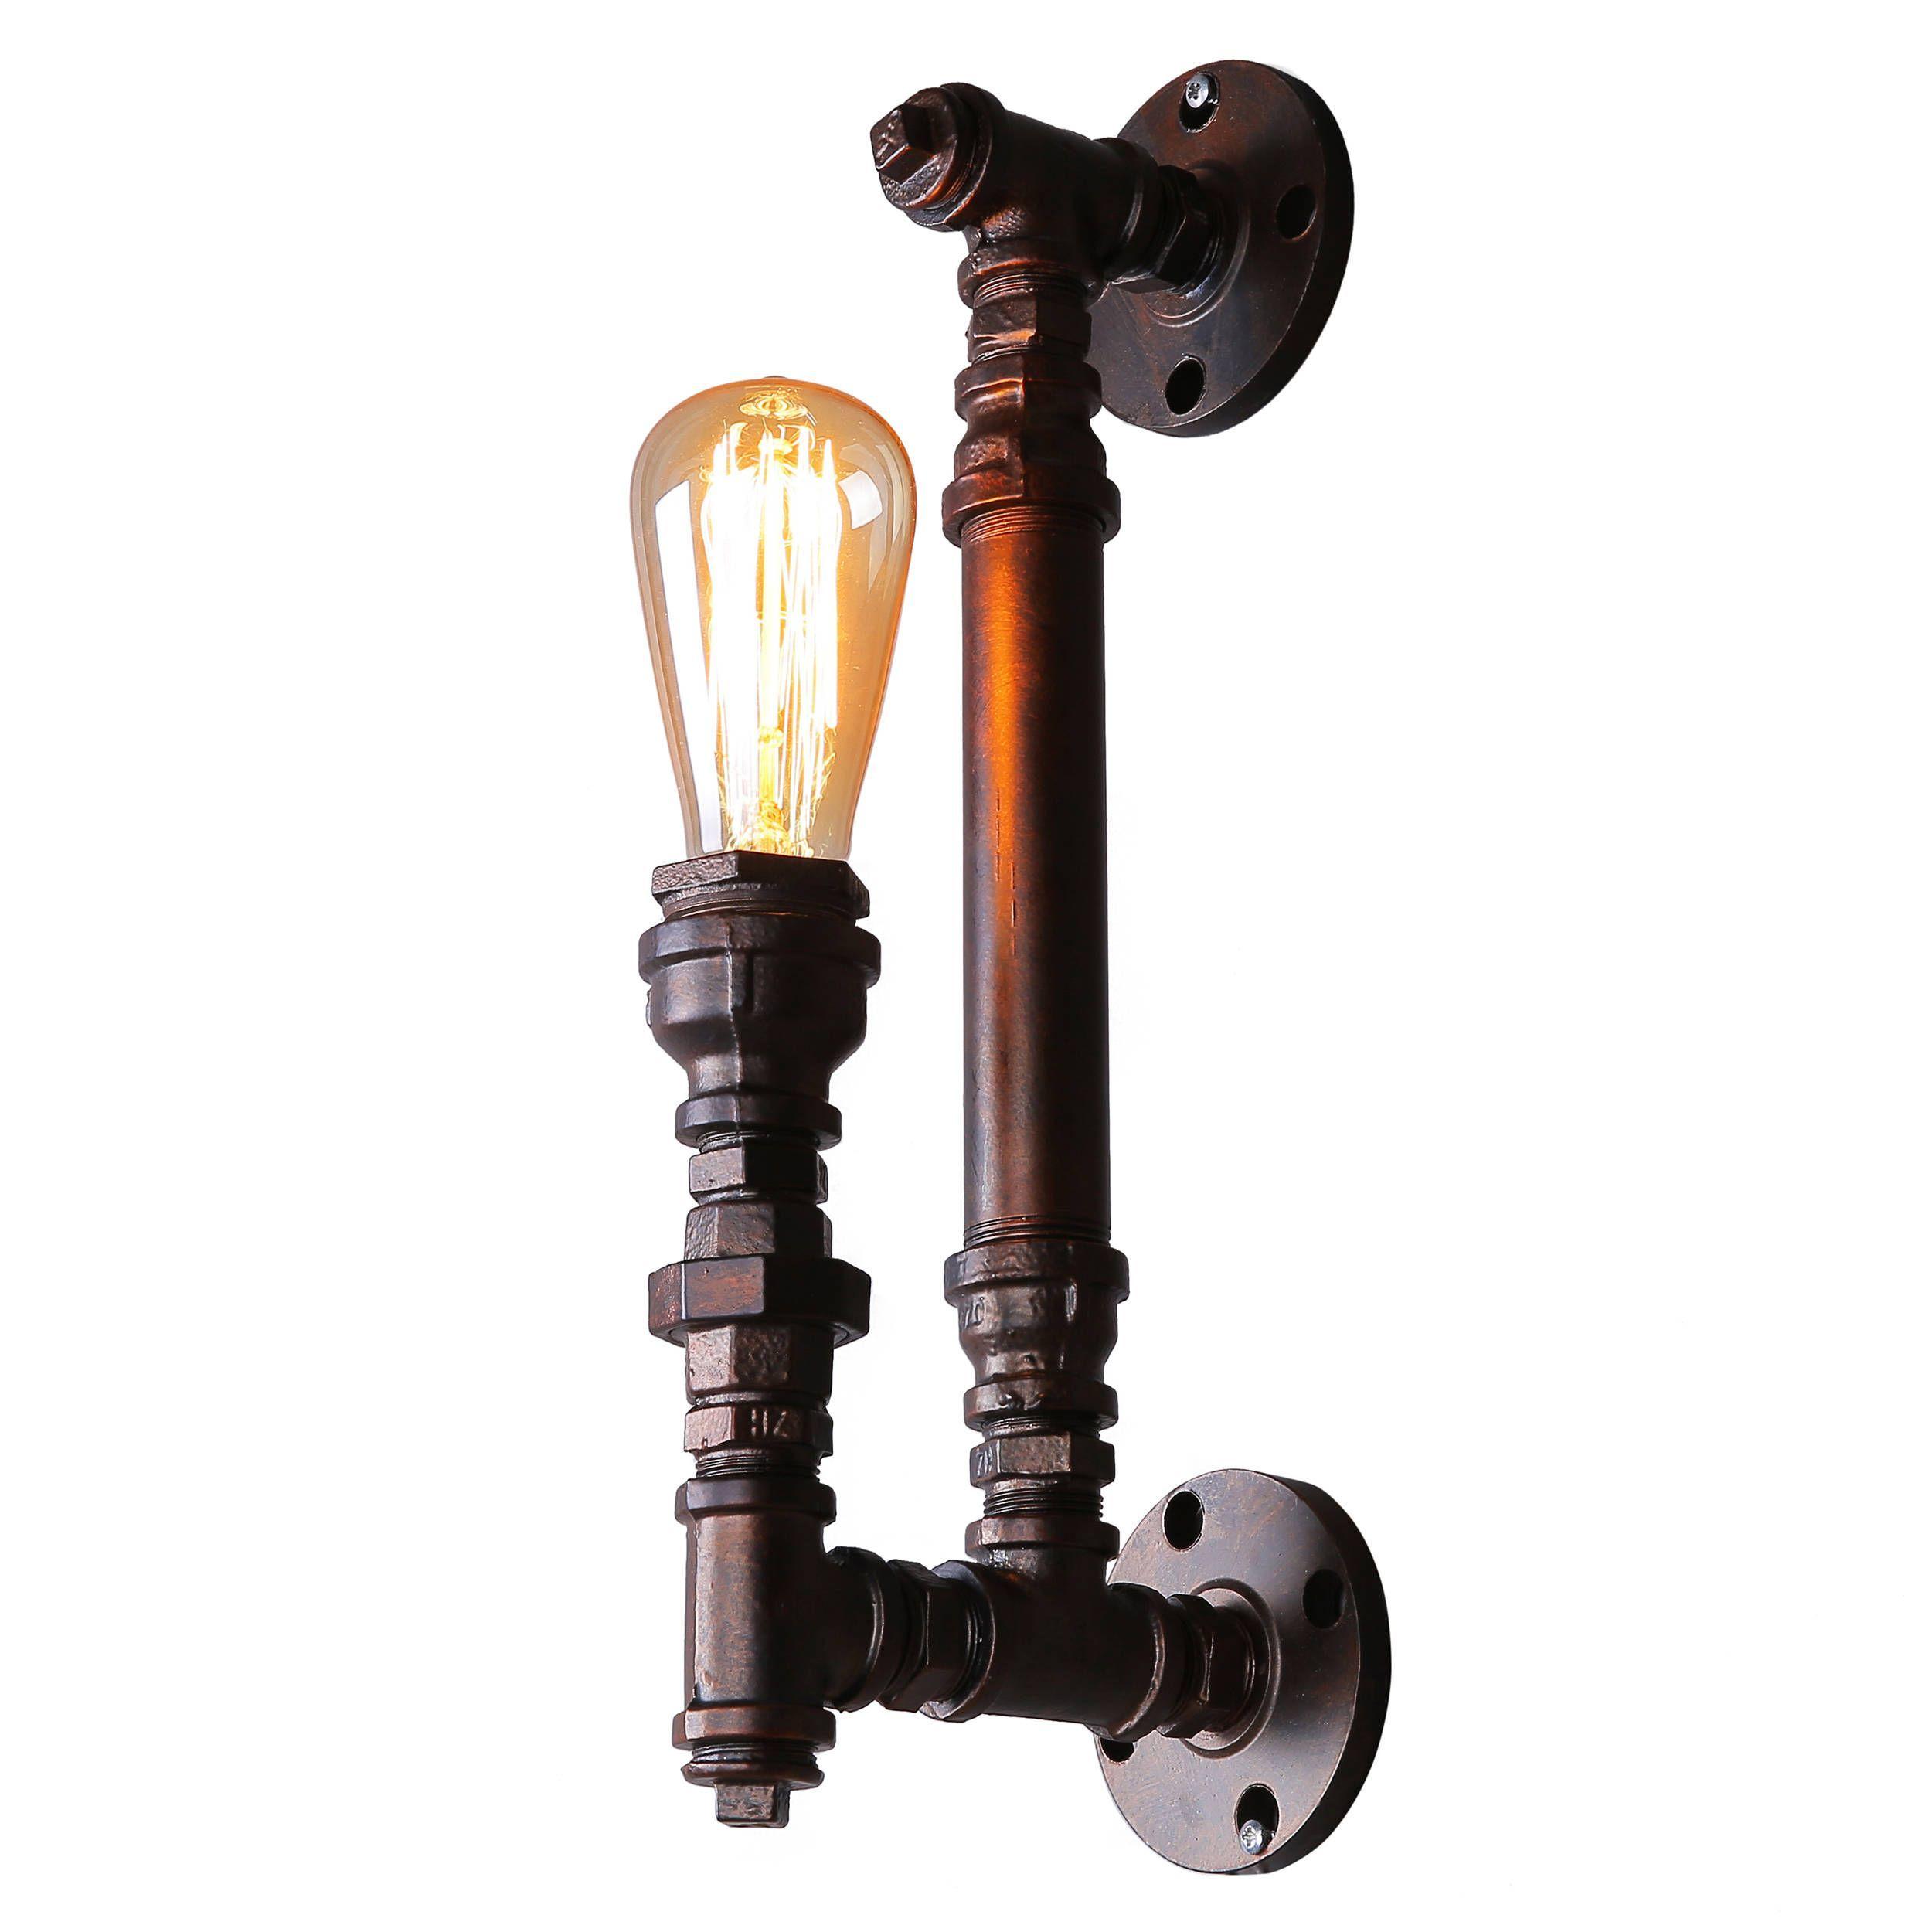 journee lighting. Journee Home \u0027Fitzgerald\u0027 Iron 14-in Edison Bulb Included Hard Wired Wall Sconce (Grey) Lighting U